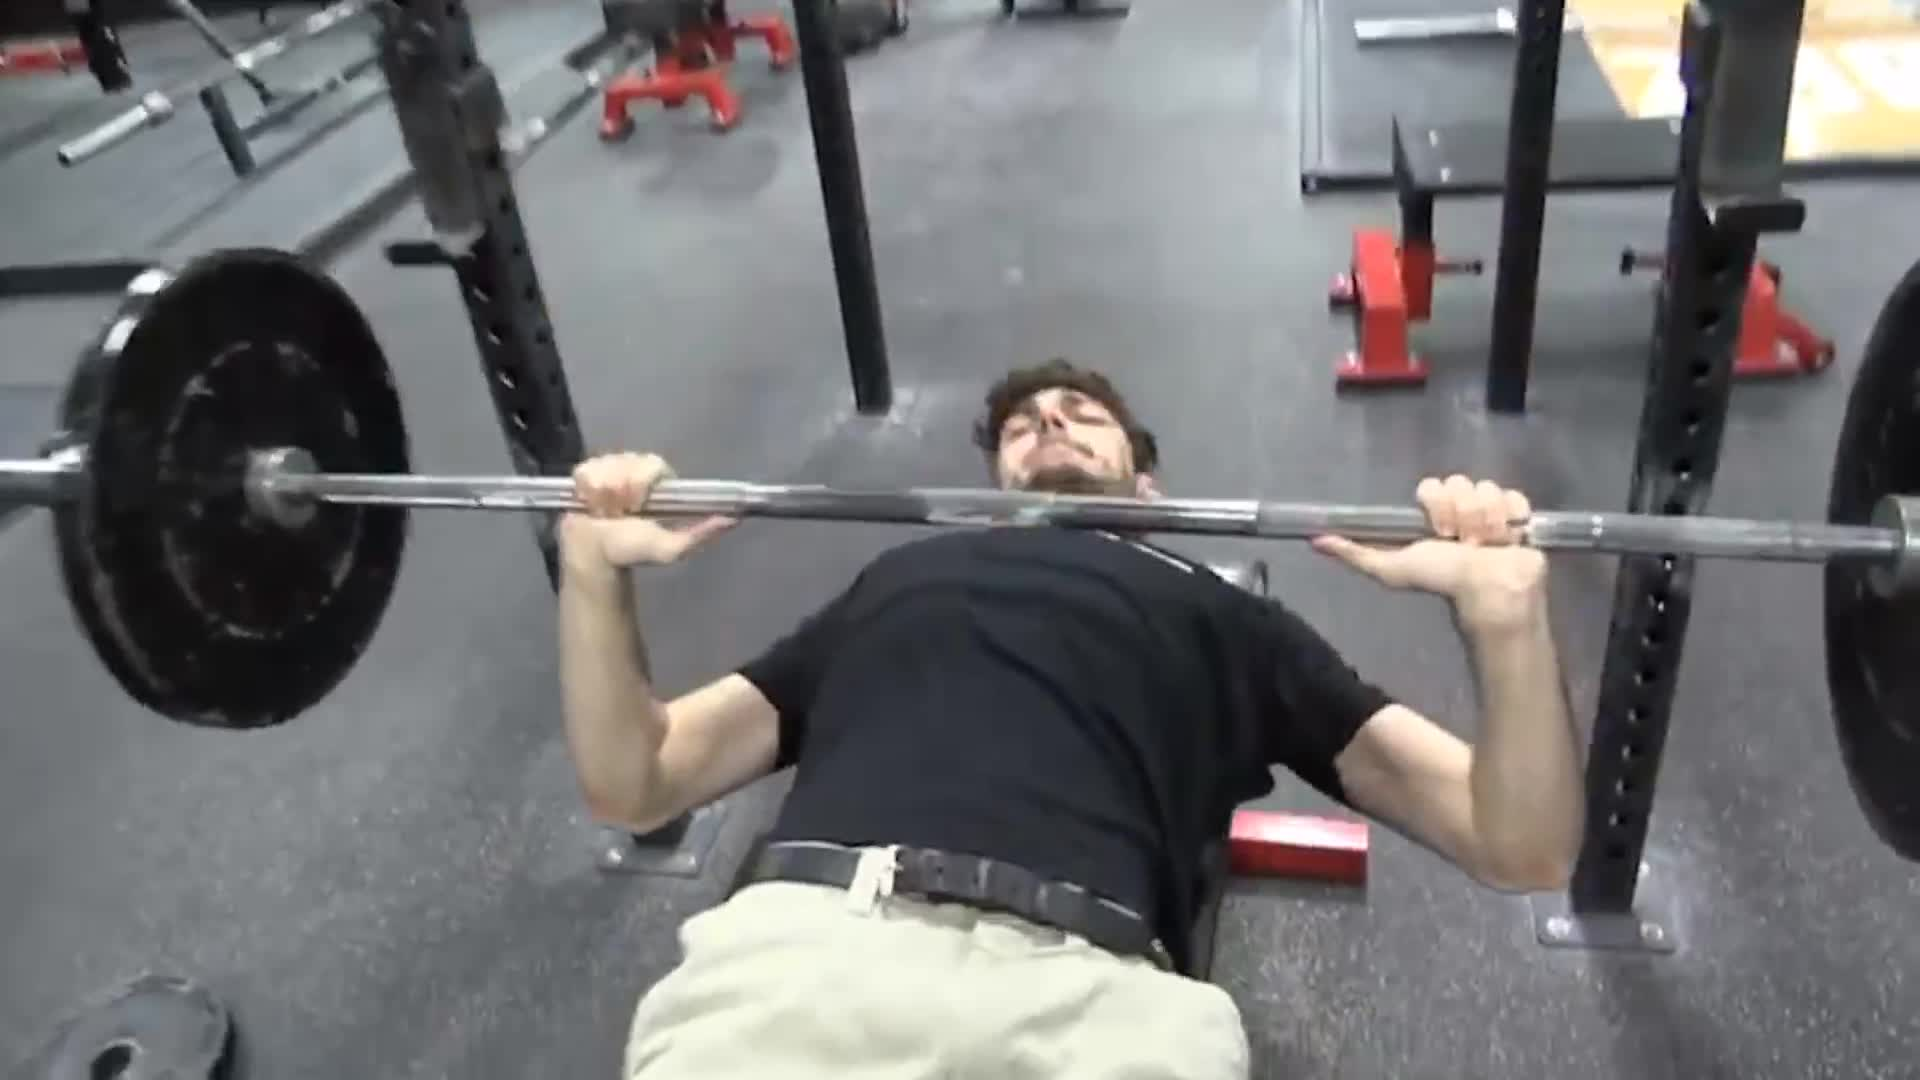 Ice Poseidon, gym, Ice Poseidon GIFs